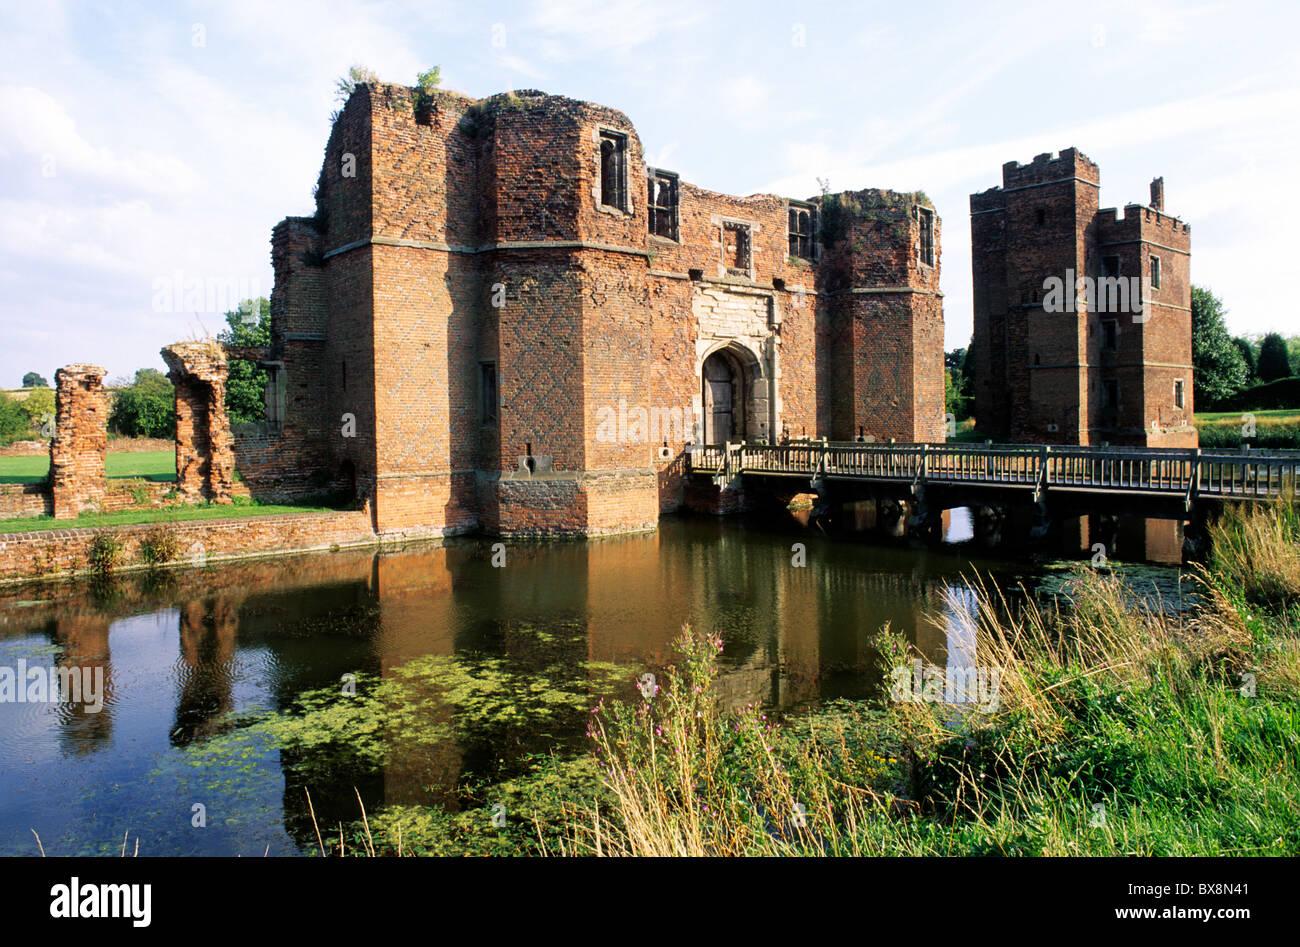 Kirby Muxloe Castle Leicestershire Moat Ruined